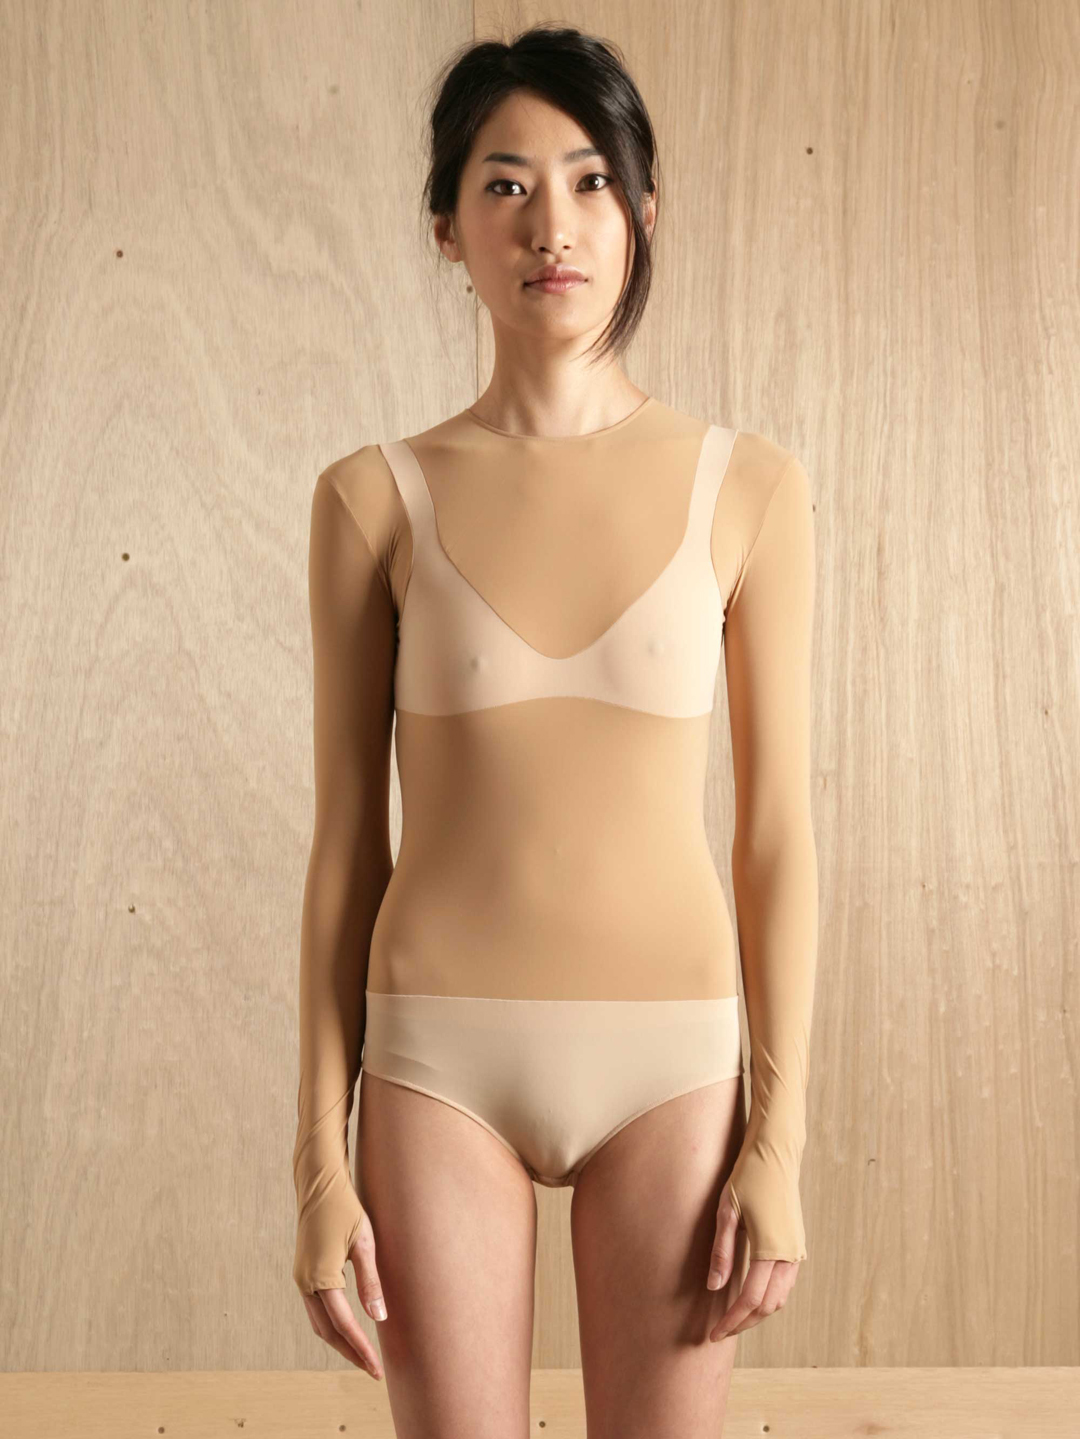 Woman S Nude Body 60